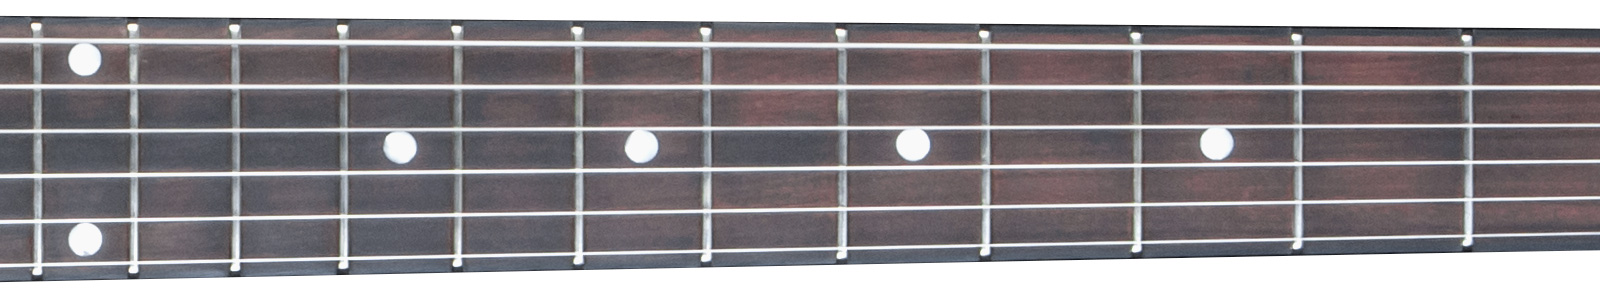 Gibson Memphis ES-335 Studio